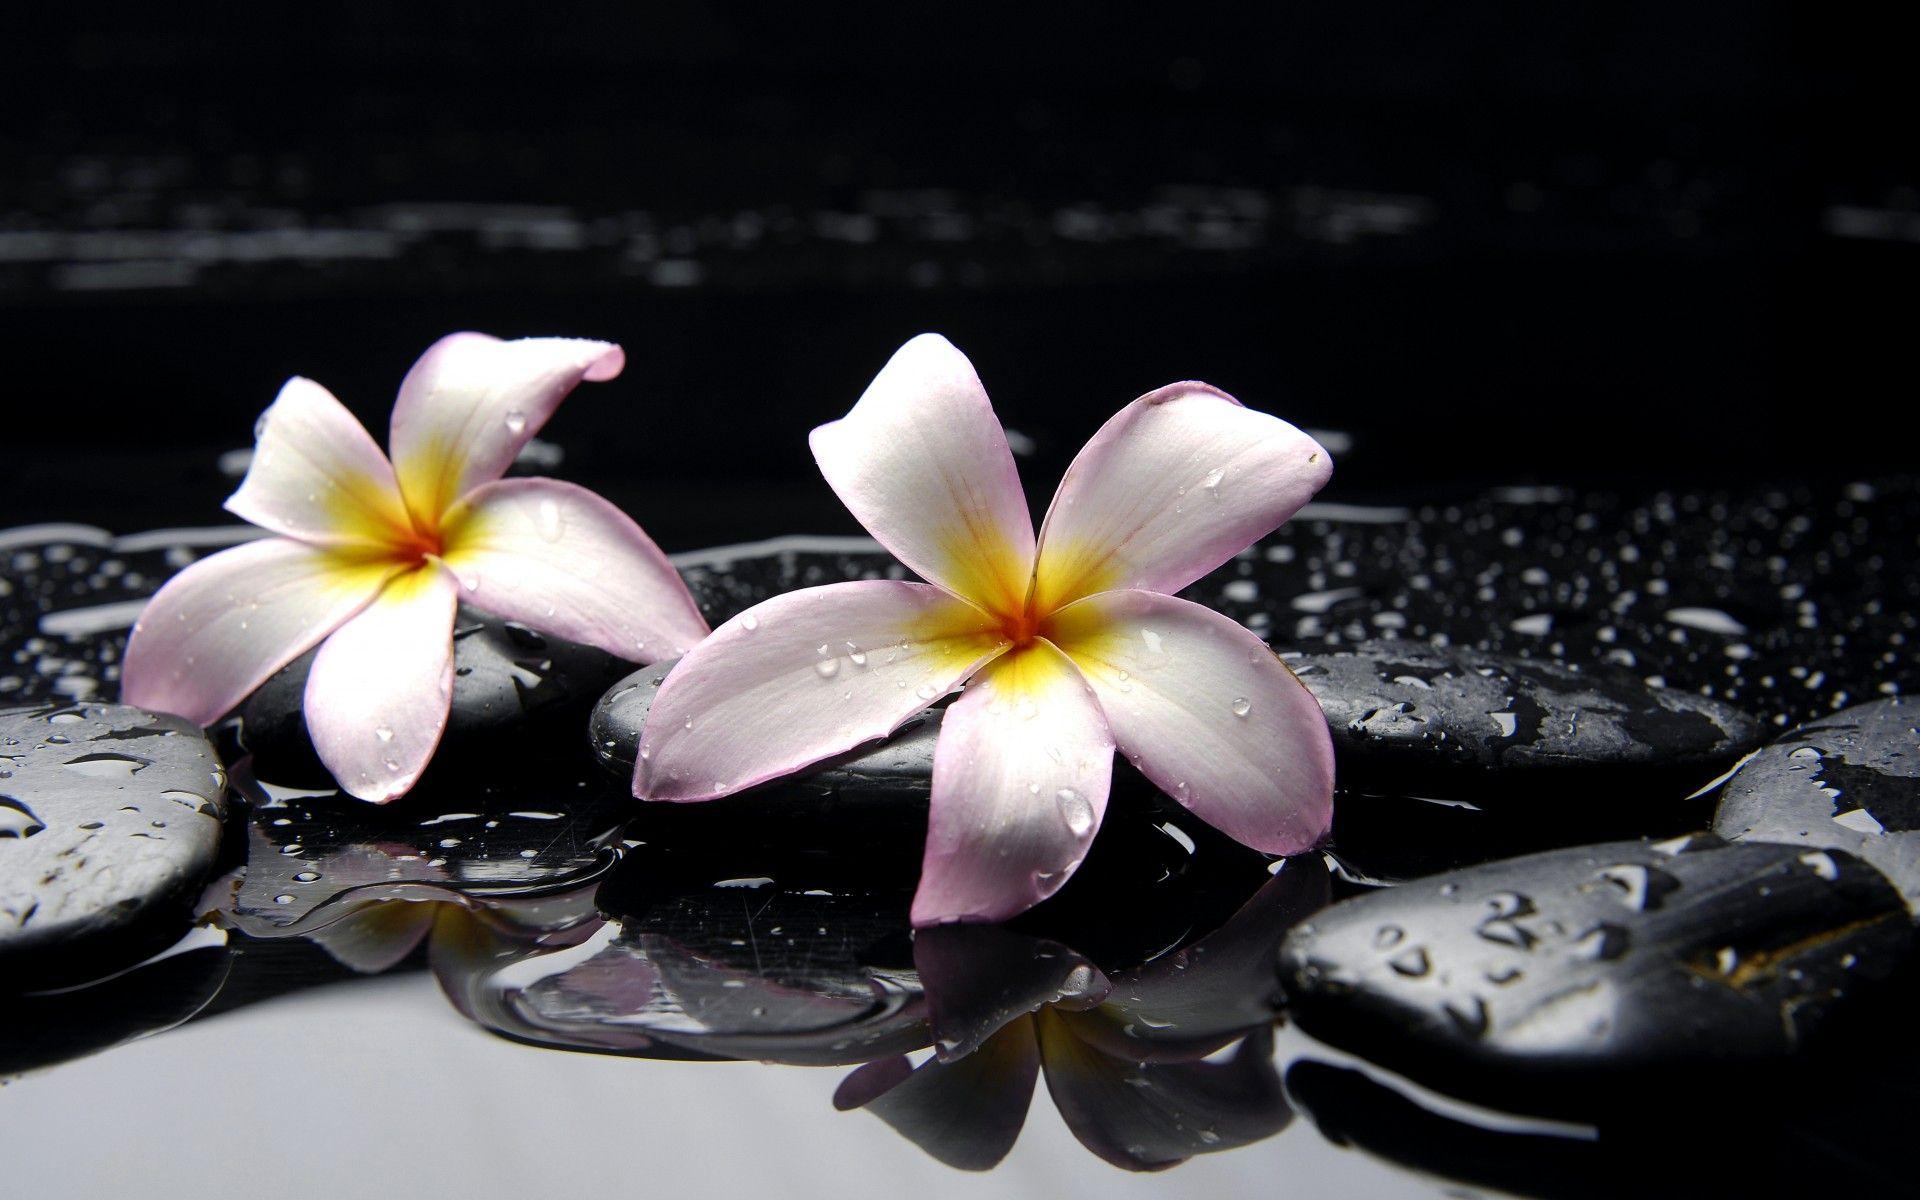 dark water wallpaper plumeria flowers wallpaper, pink